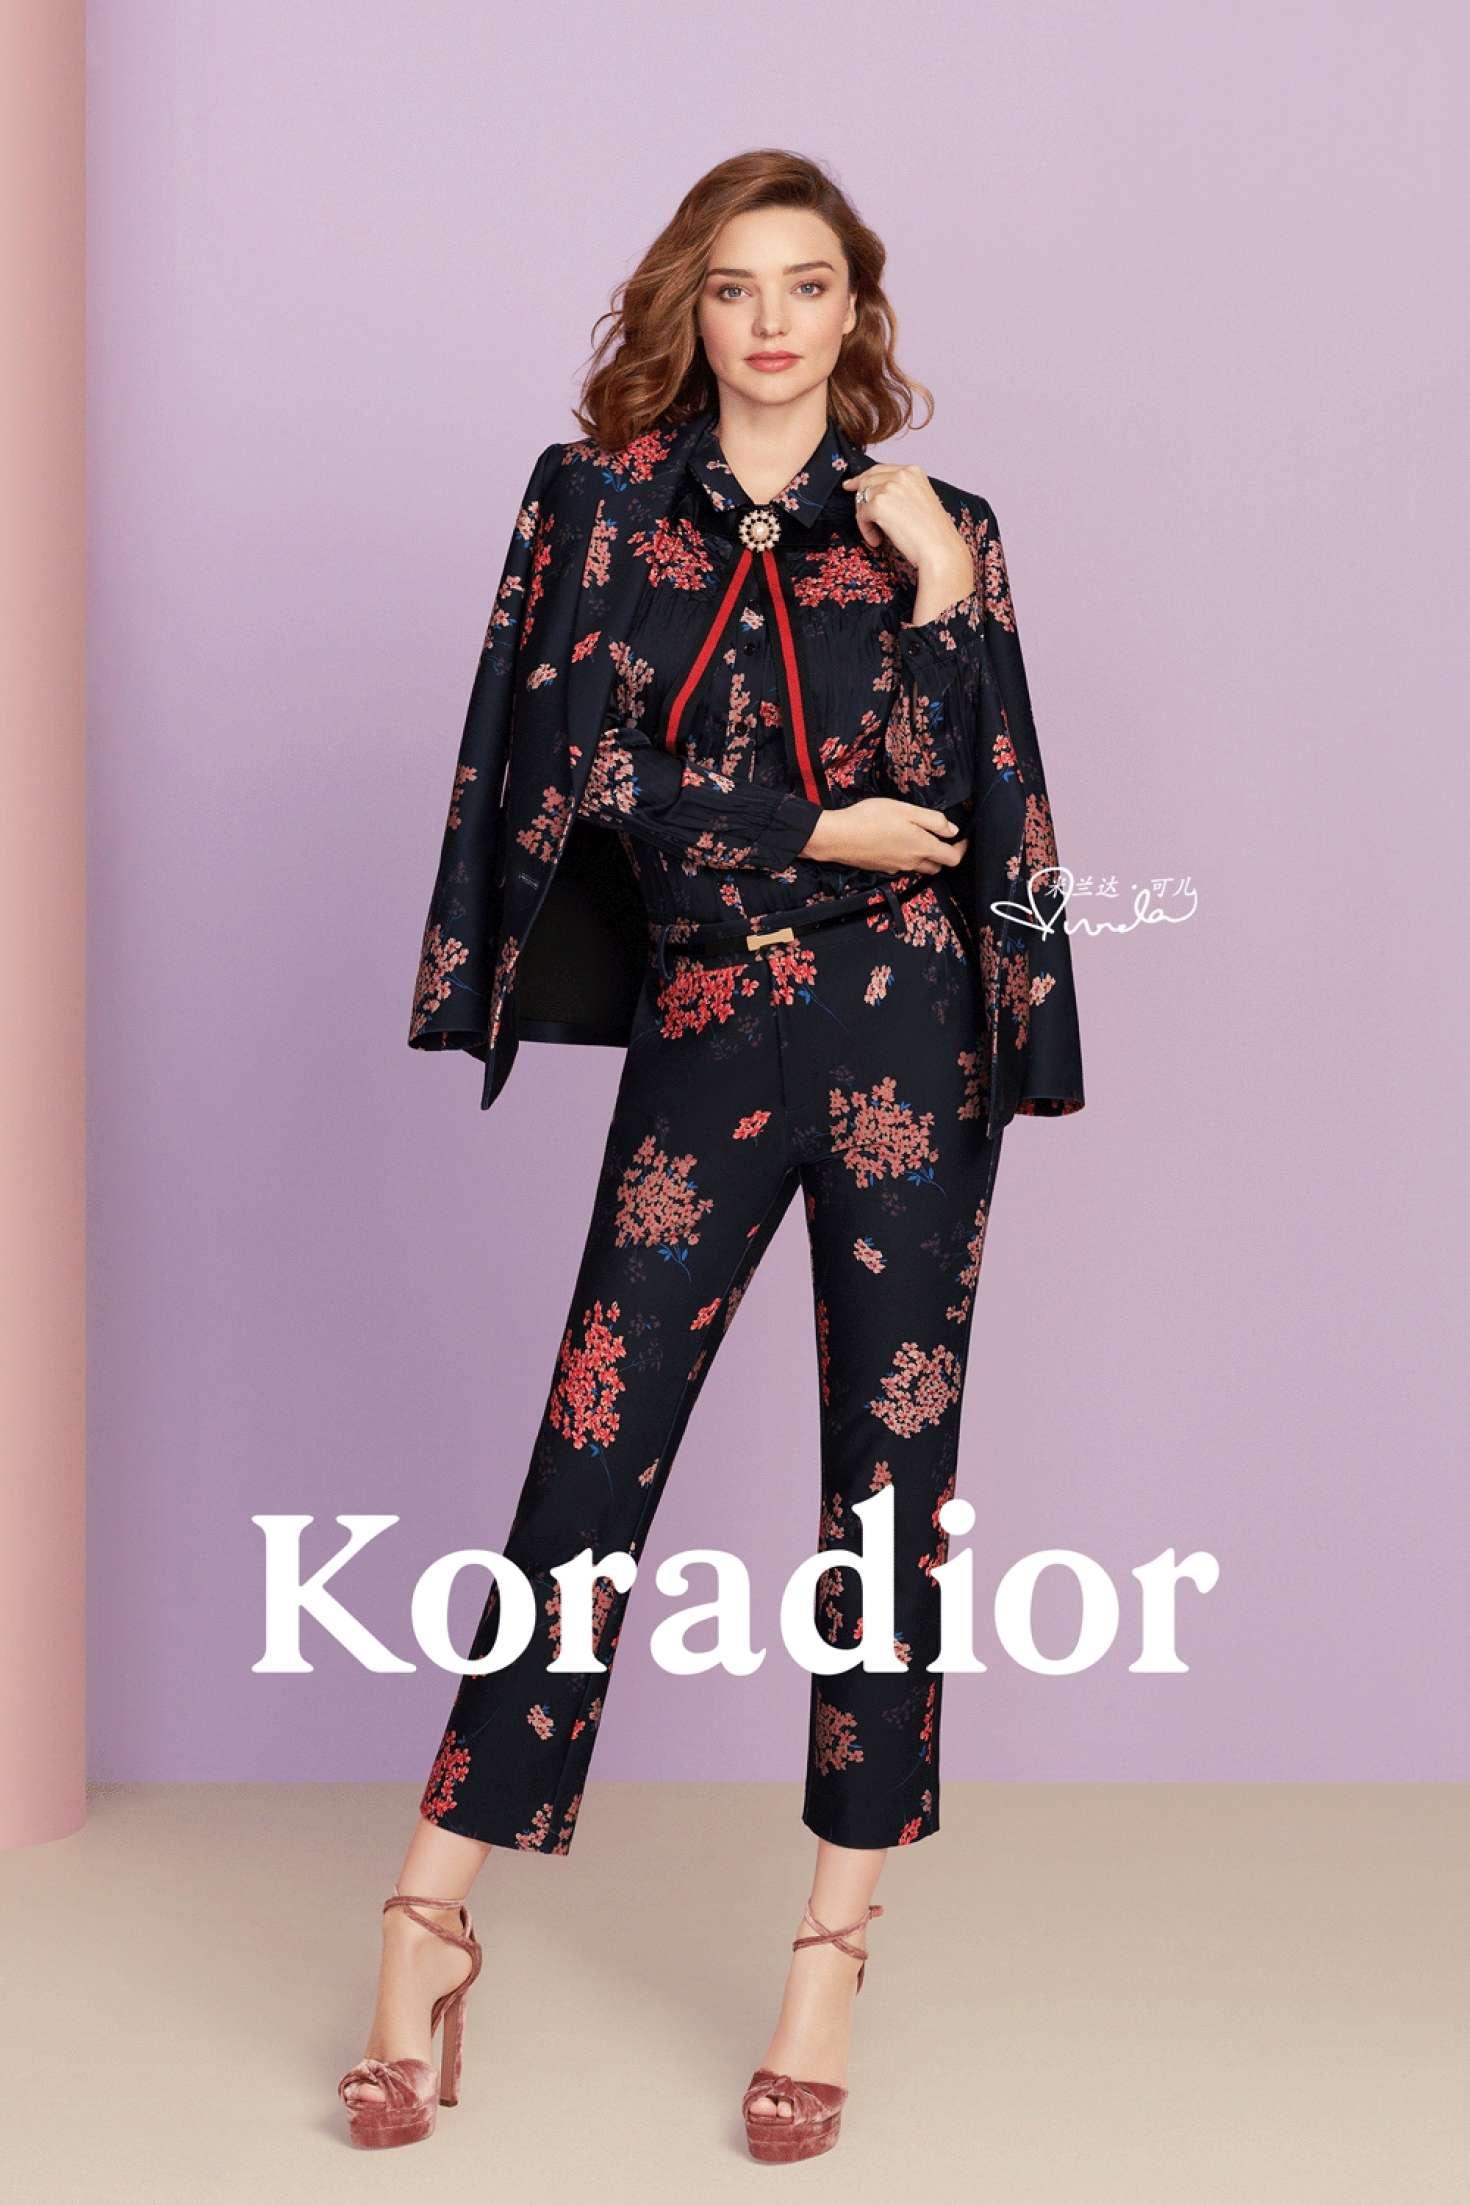 Miranda Kerr 2017 : Miranda Kerr: Koradior Spring 2018 Campaign -03